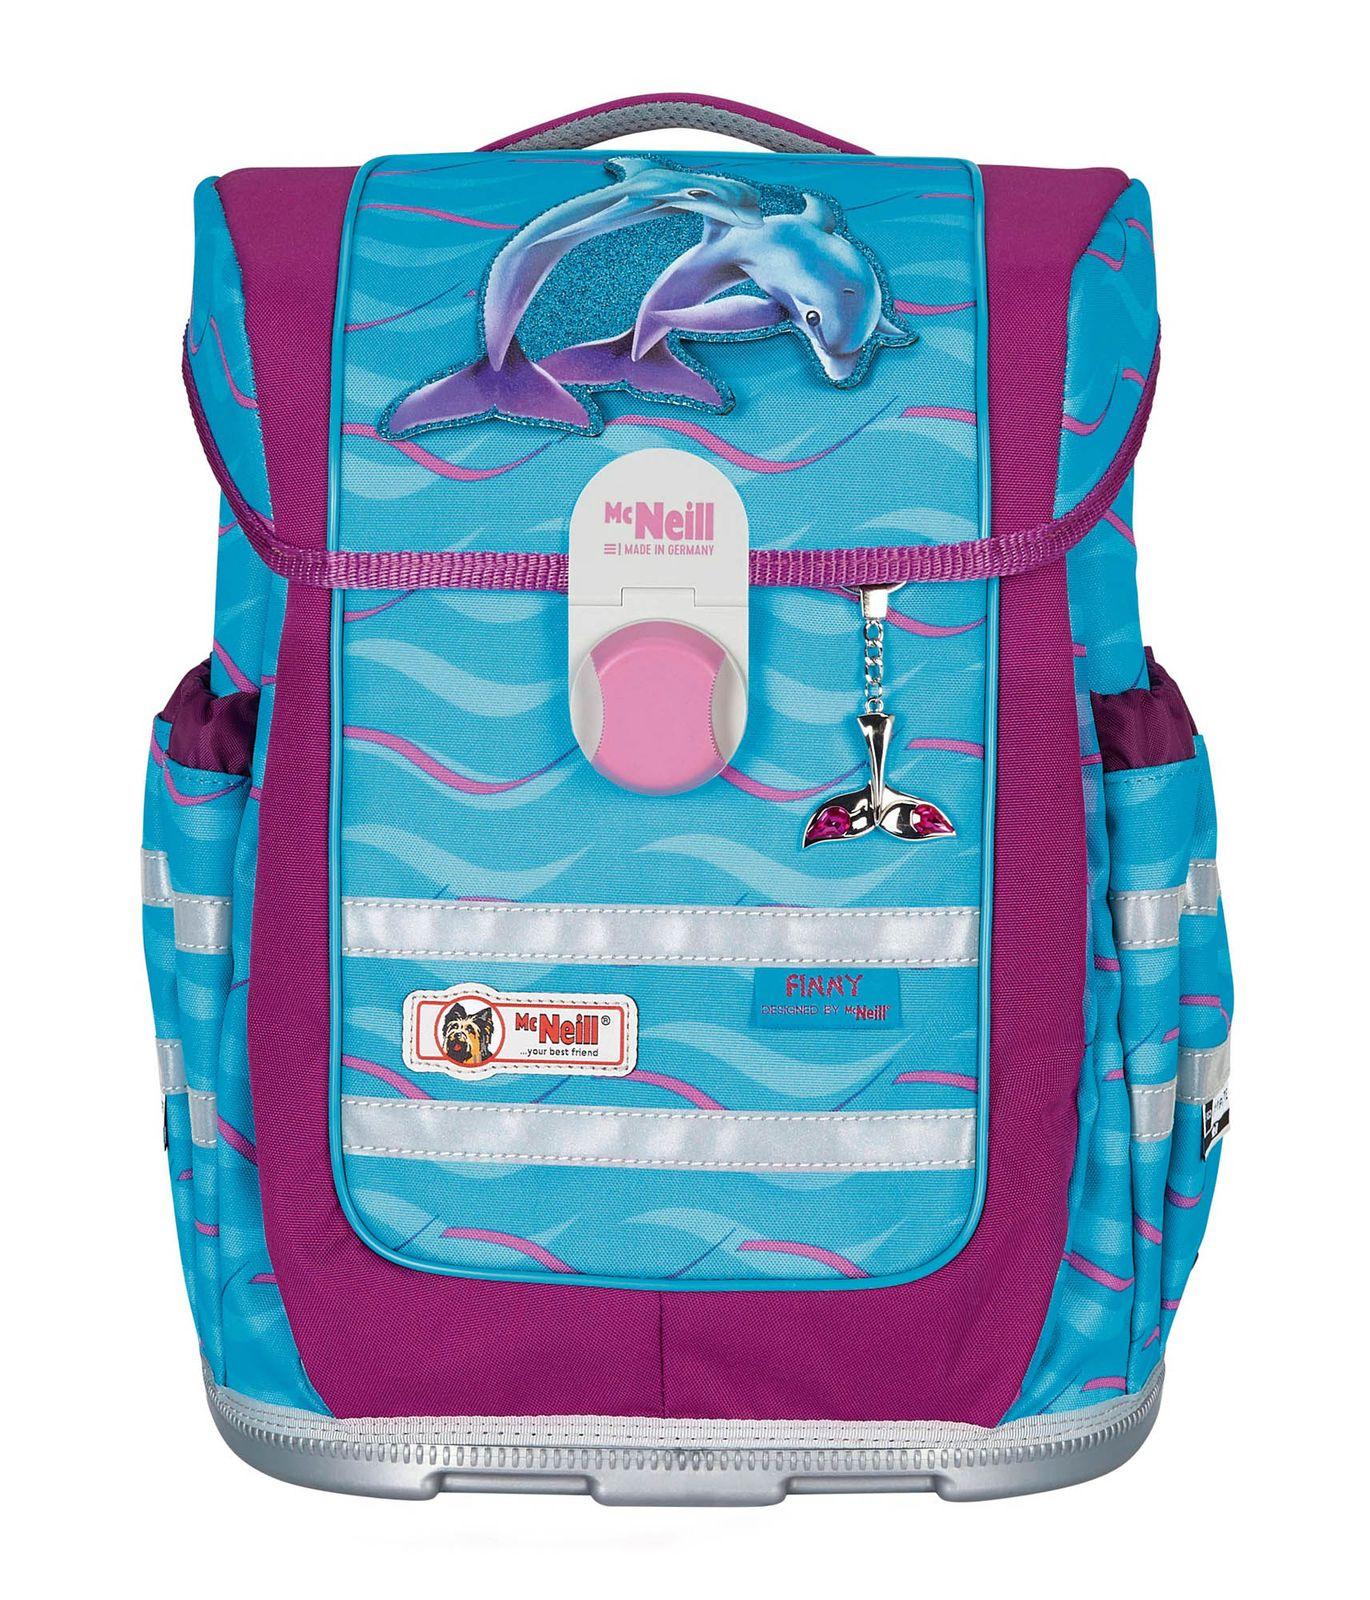 McNeill Ergo Complete Schoolbag Finny